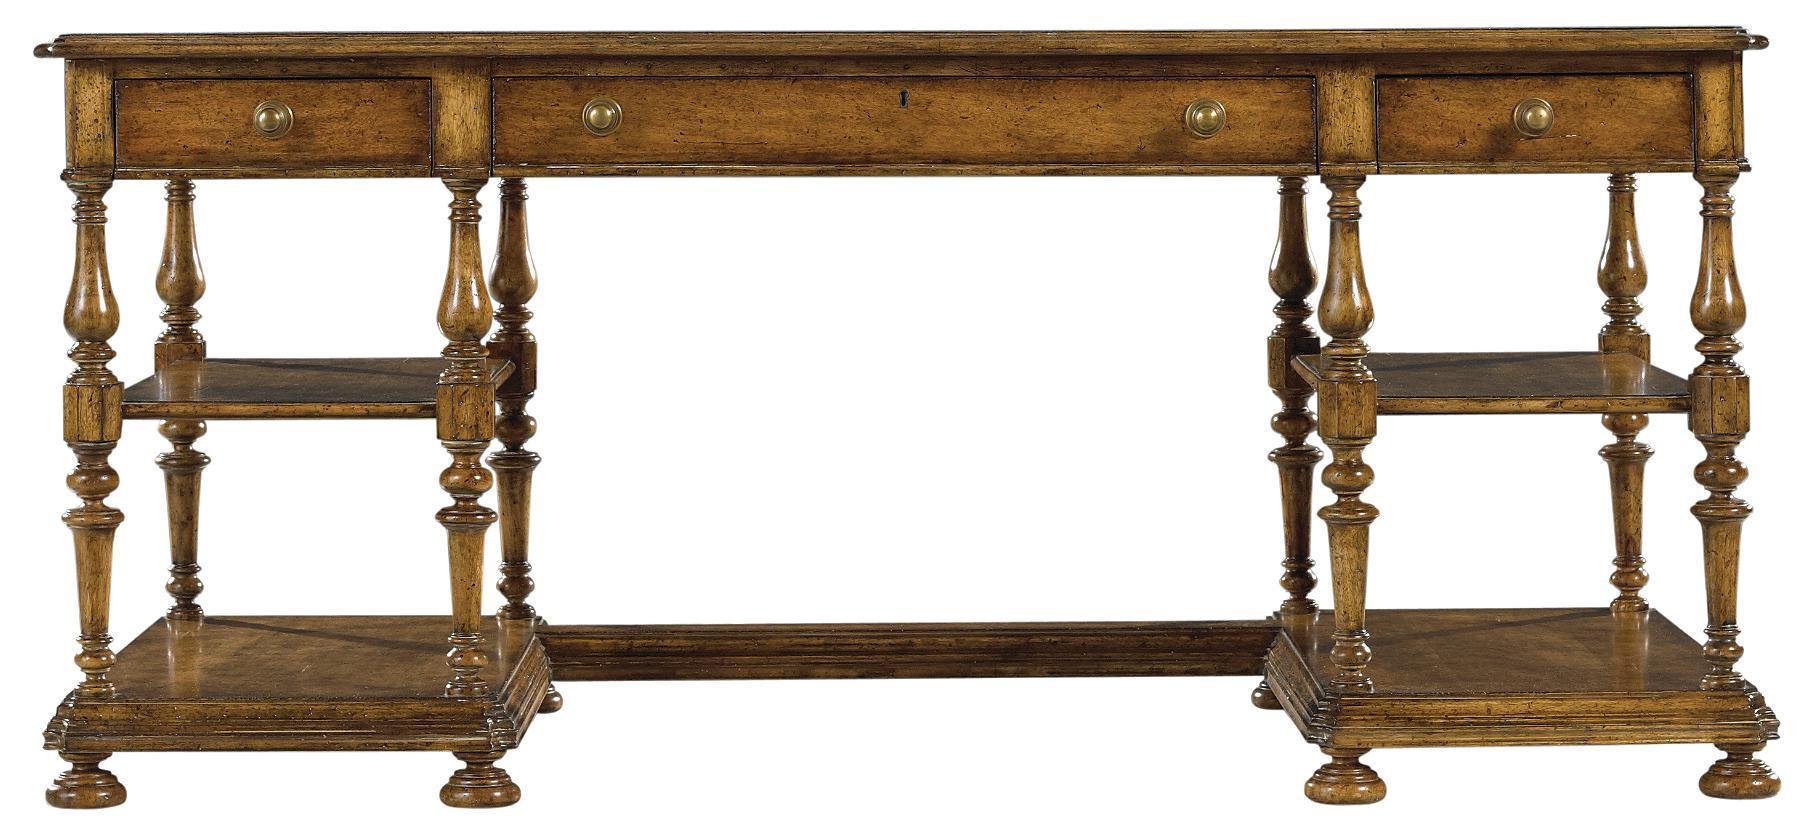 Stanley Furniture Arrondissement Esprit Writing Desk - Item Number: 222-65-03